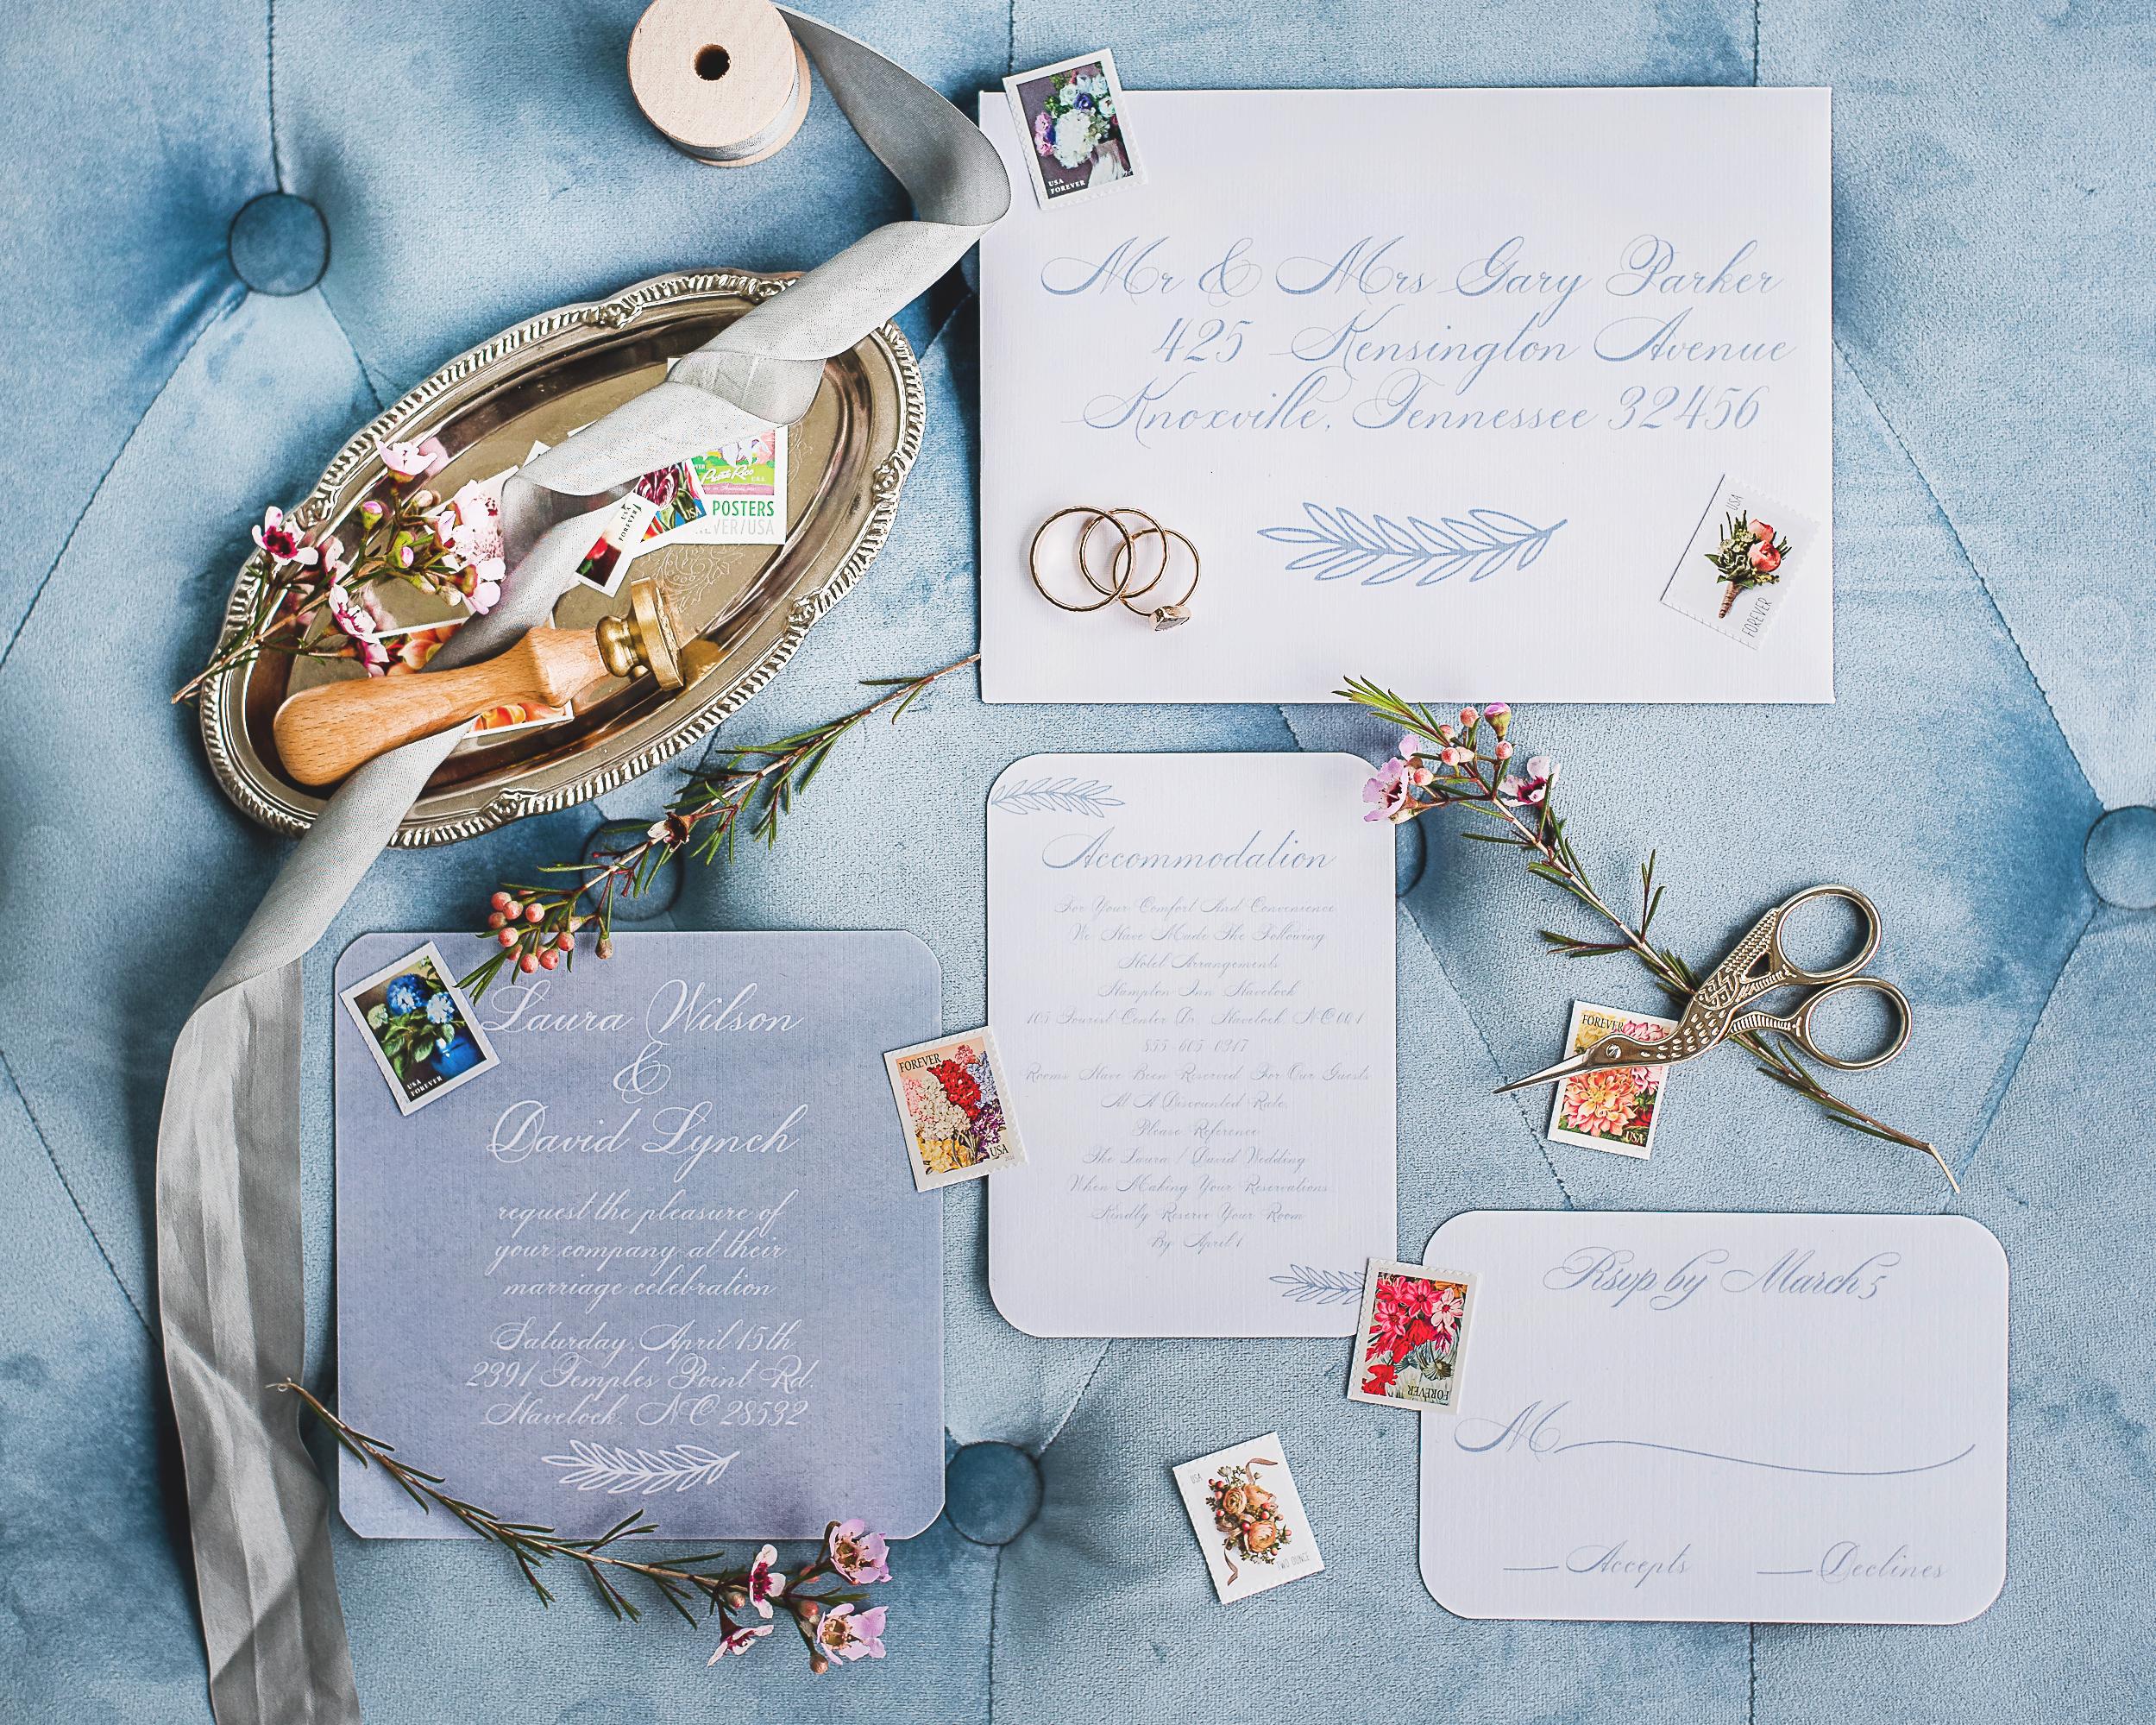 handwritten calligraphy wedding invitation blue themed